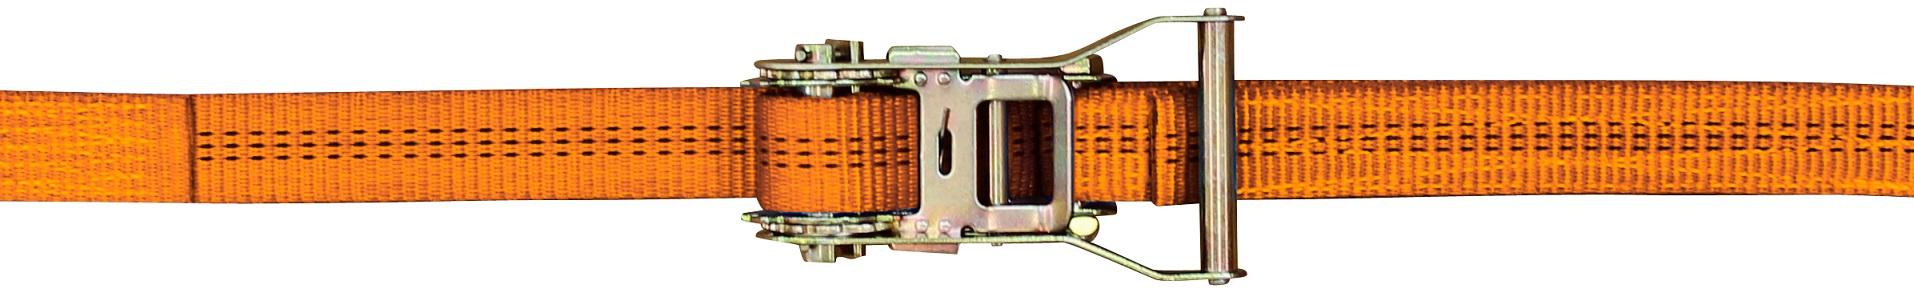 Ratschengurt Plus 35 mm